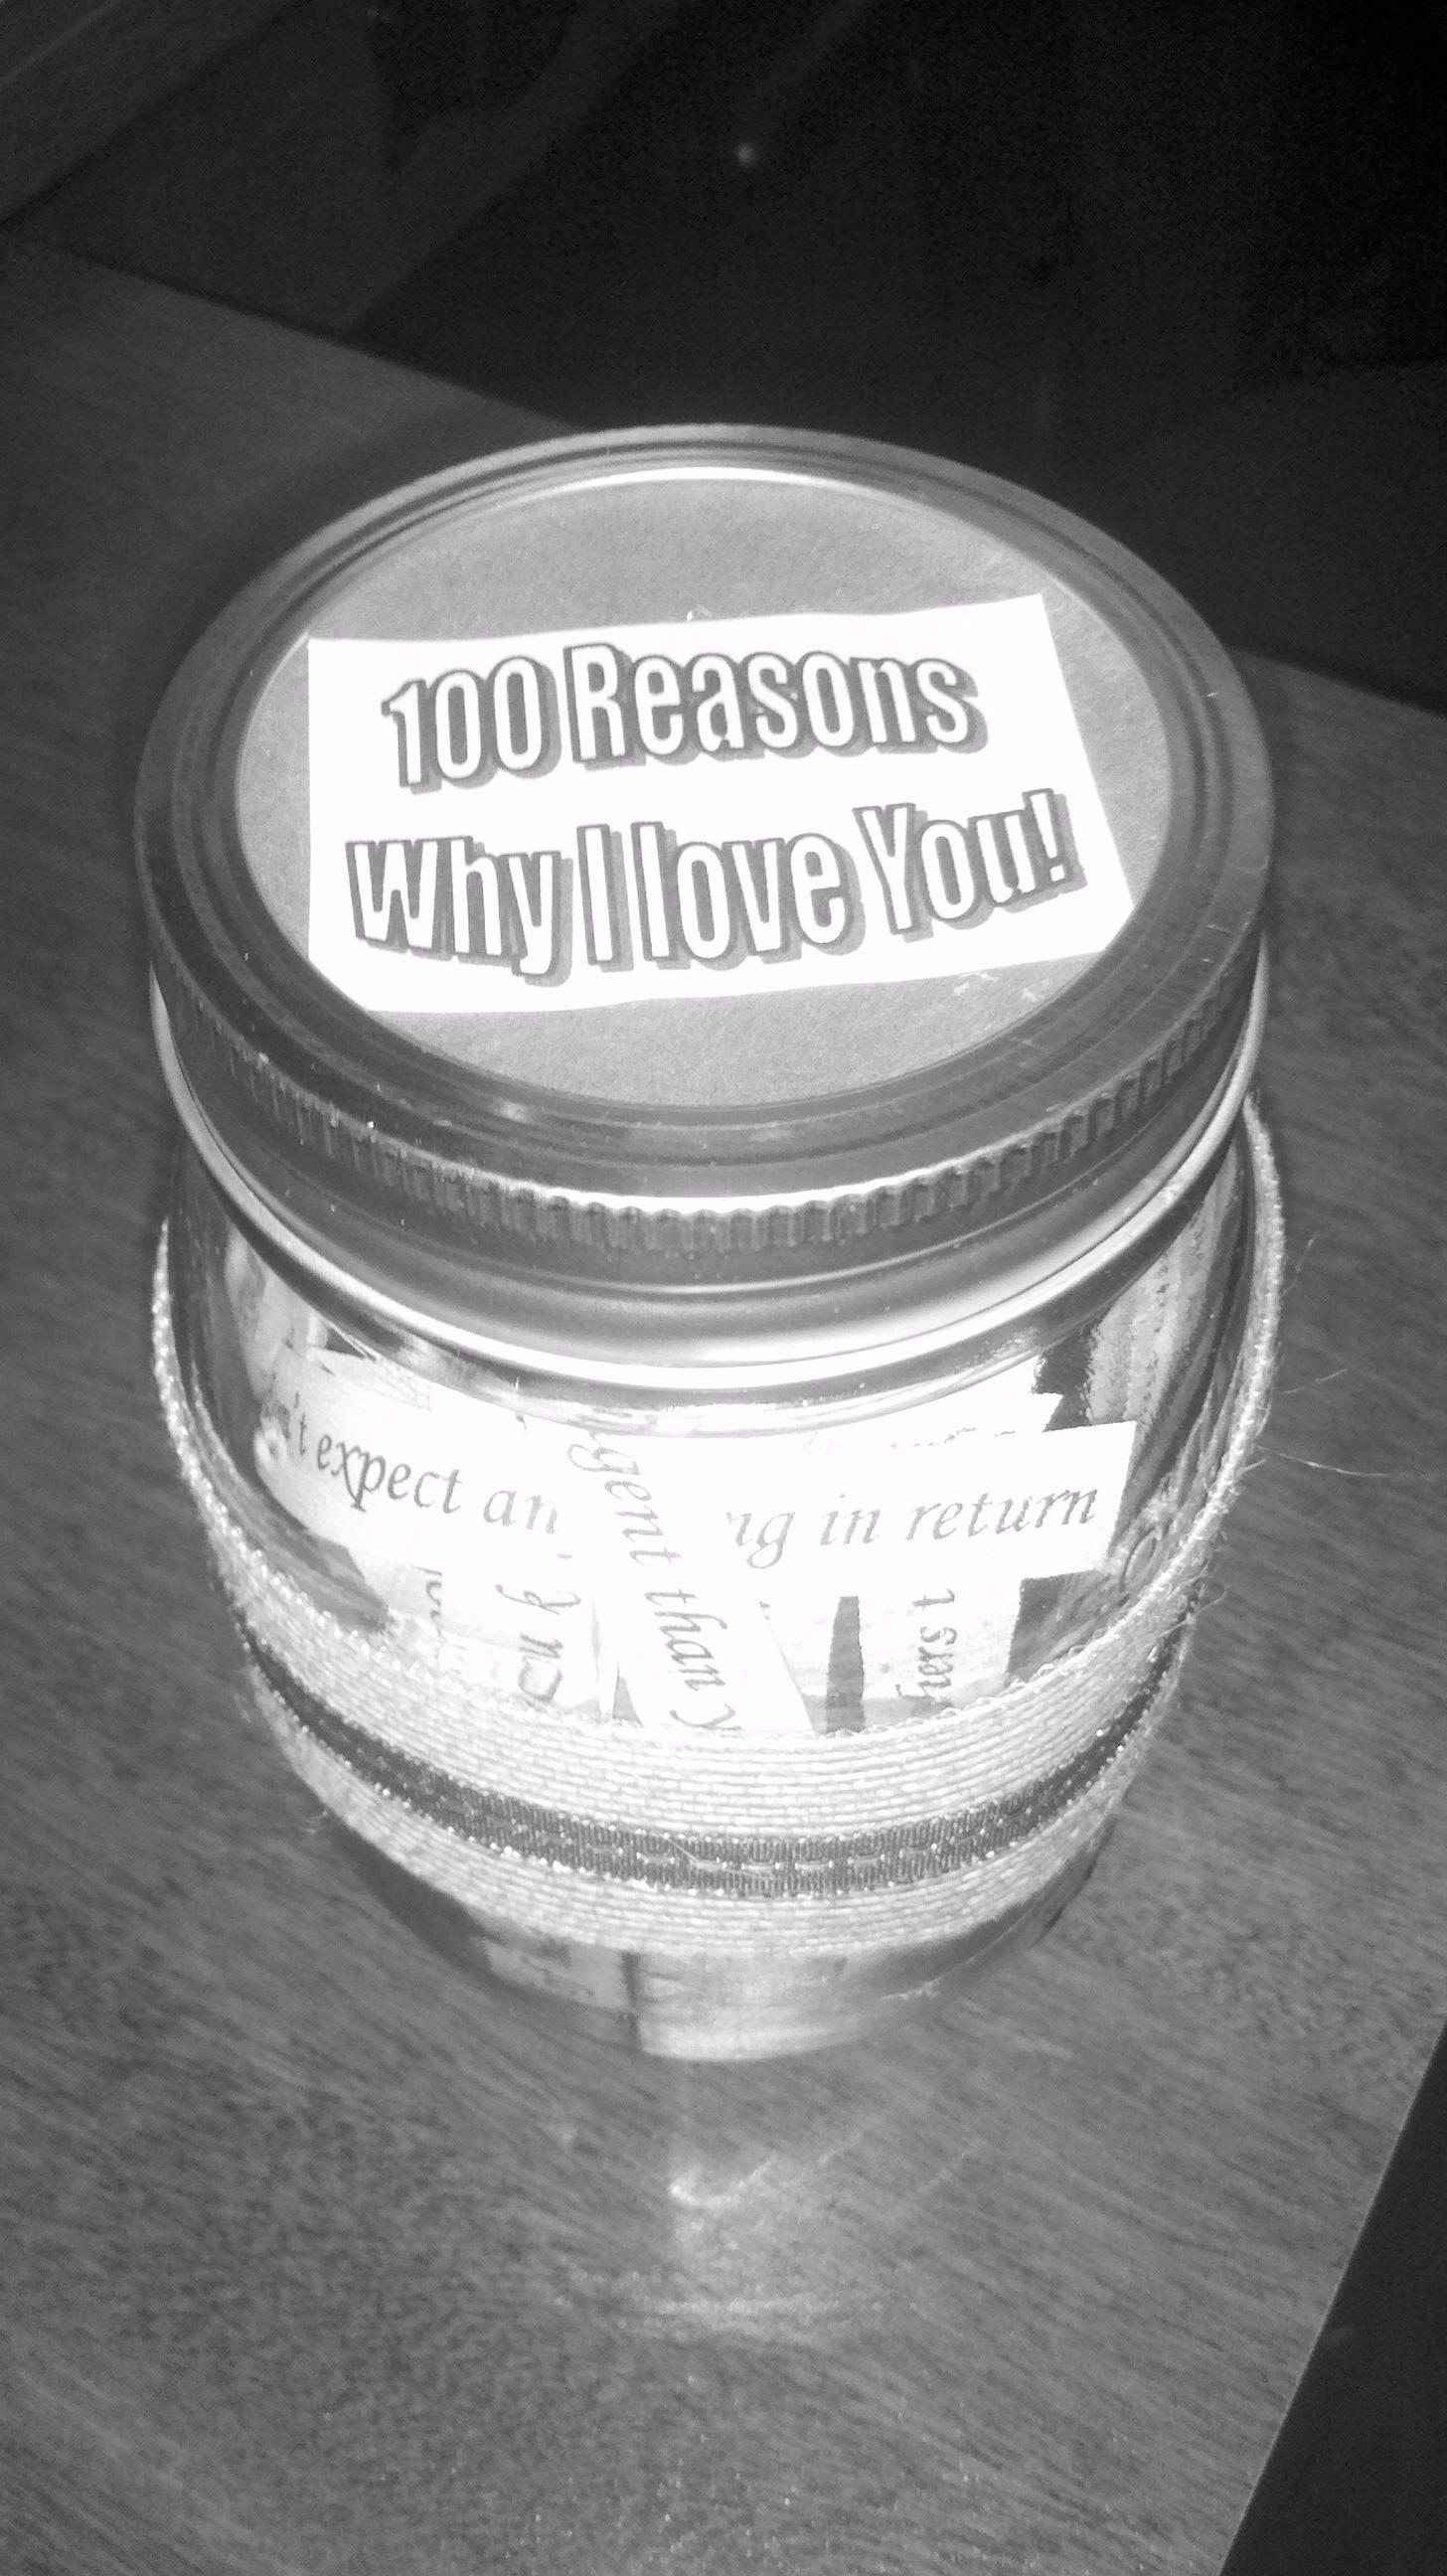 100 reasons why 'I love you'